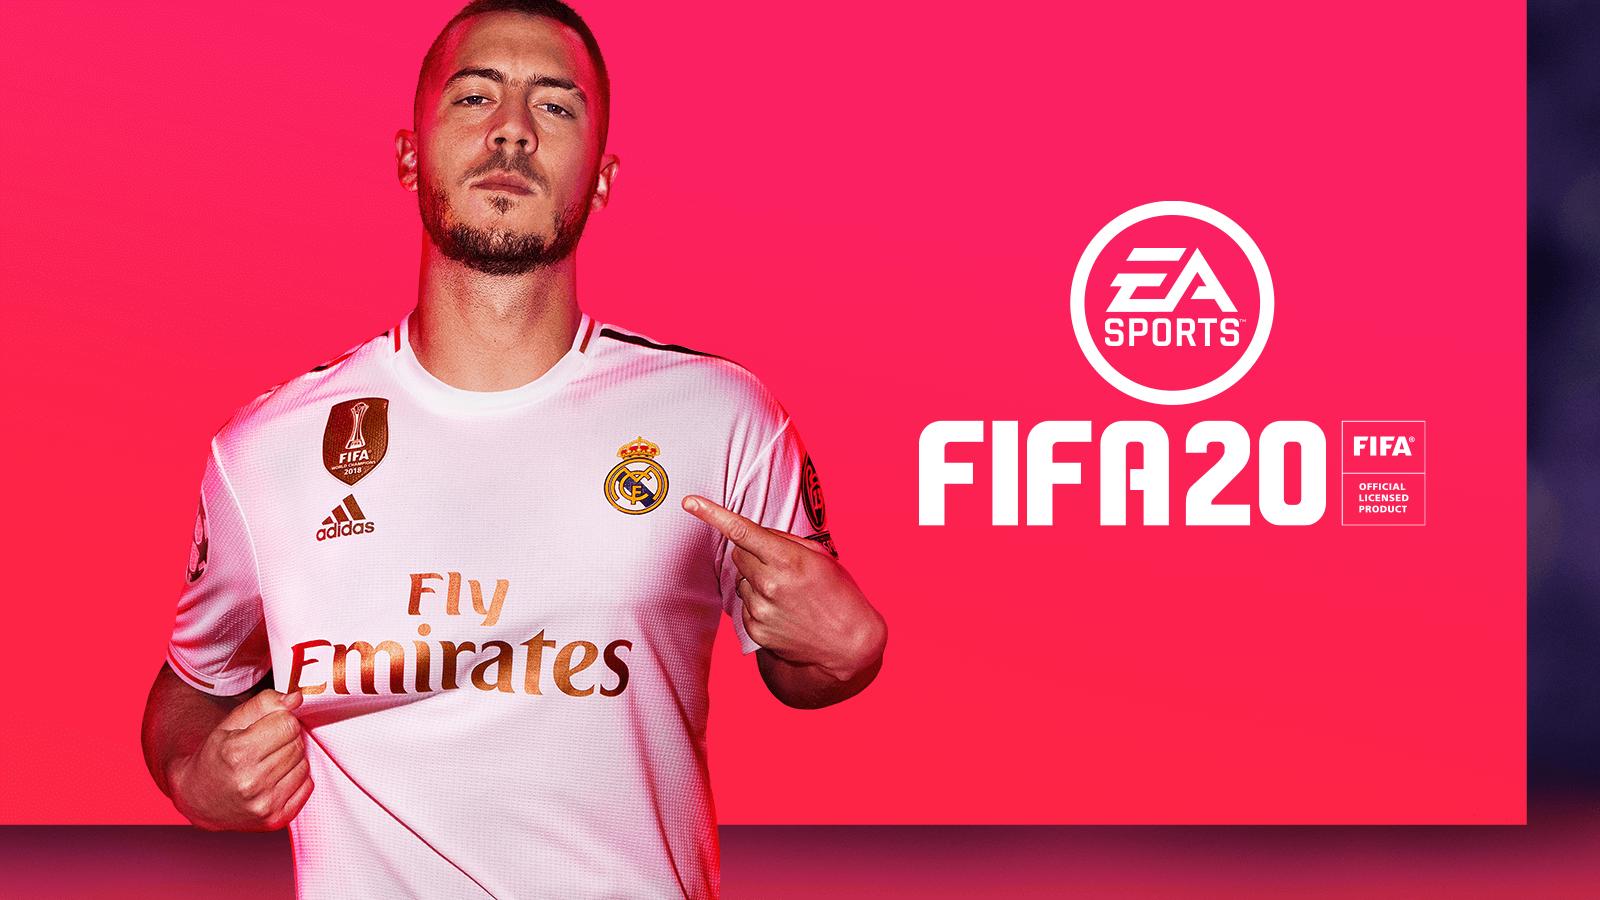 FIFA 20 (GLOBAL) + ПОДАРОК